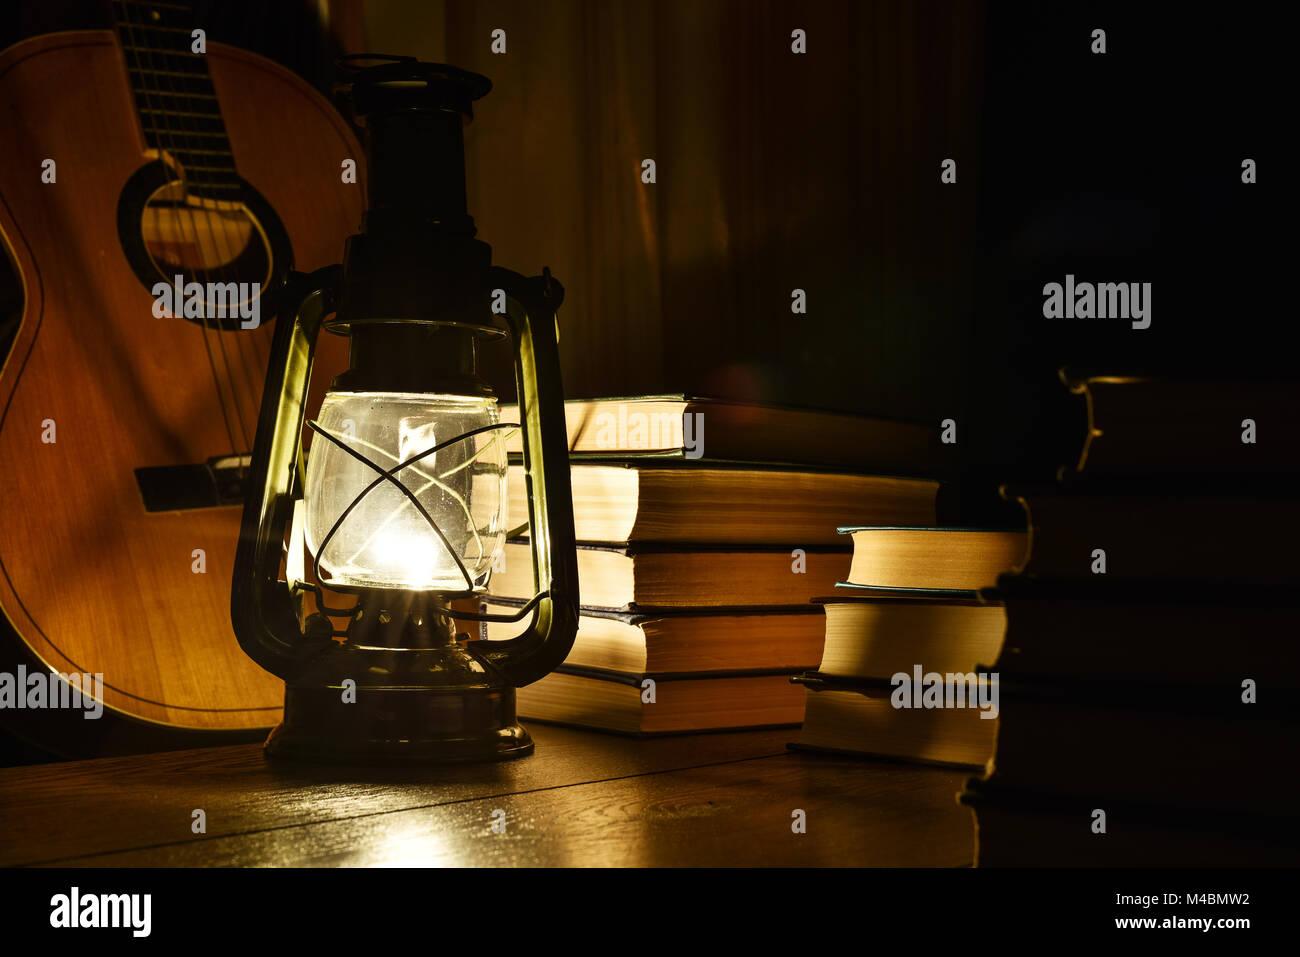 Luminous kerosene lamp, guitar and books on the table - Stock Image